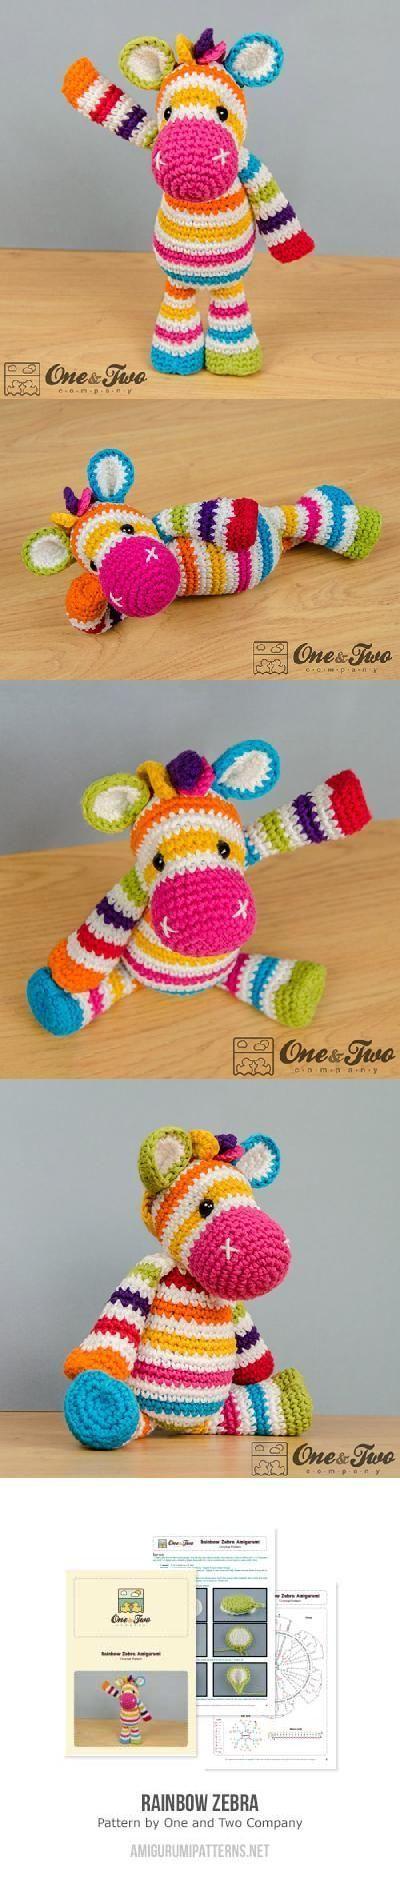 Rainbow zebra amigurumi pattern by One and Two Company | Pinterest ...